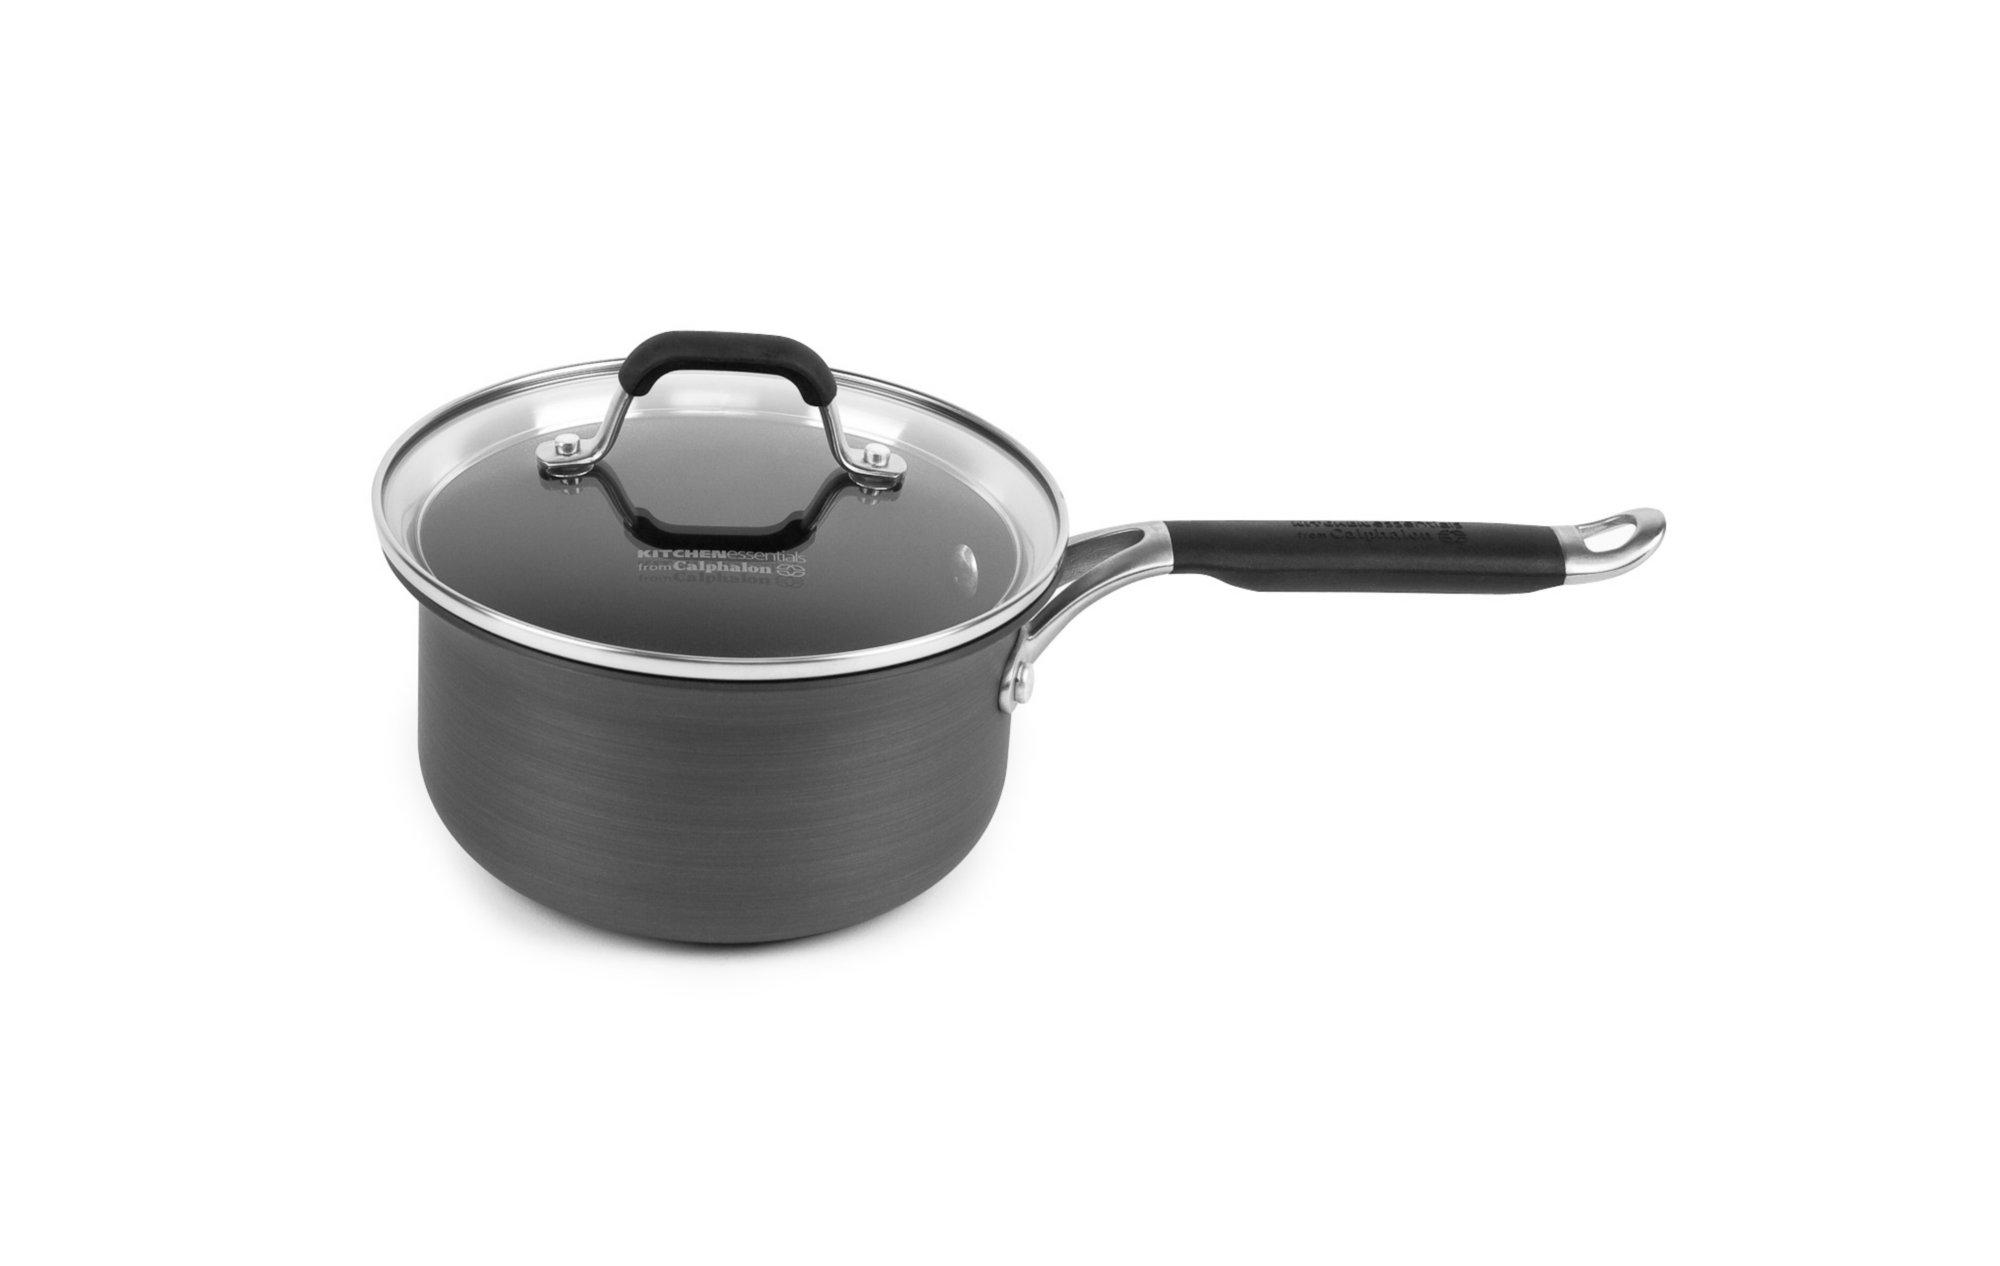 calphalon kitchen essentials dutch oven semi custom cabinets nonstick 2 qt sauce pan with cover